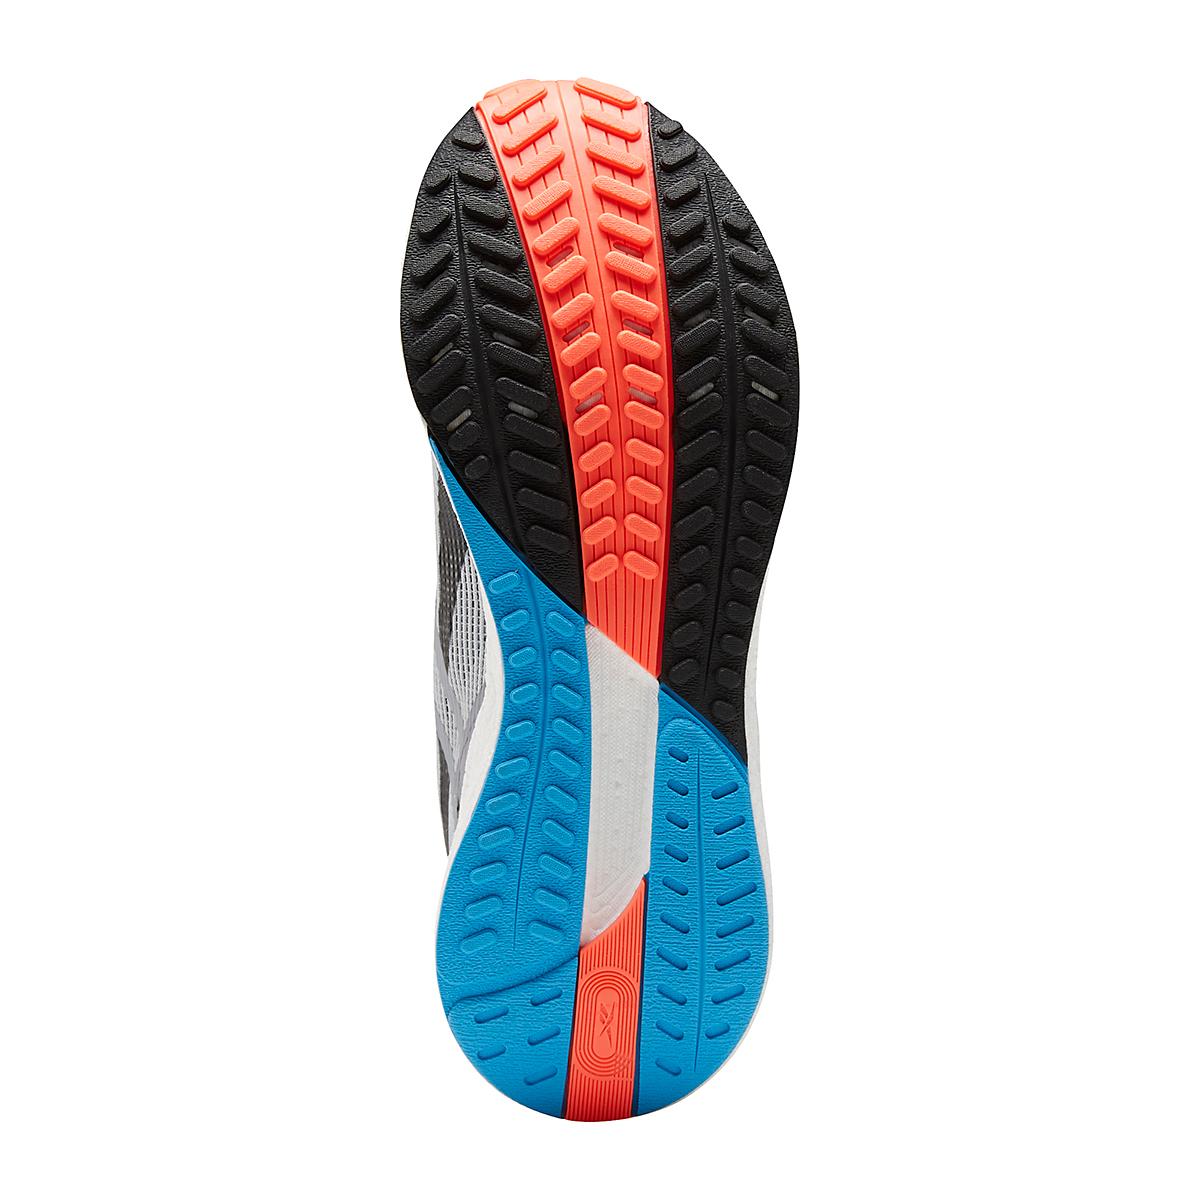 Women's Reebok Floatride Energy 3.0 Running Shoe - Color: Cold Grey/Core Black/Orange Flare - Size: 5 - Width: Regular, Cold Grey/Core Black/Orange Flare, large, image 3